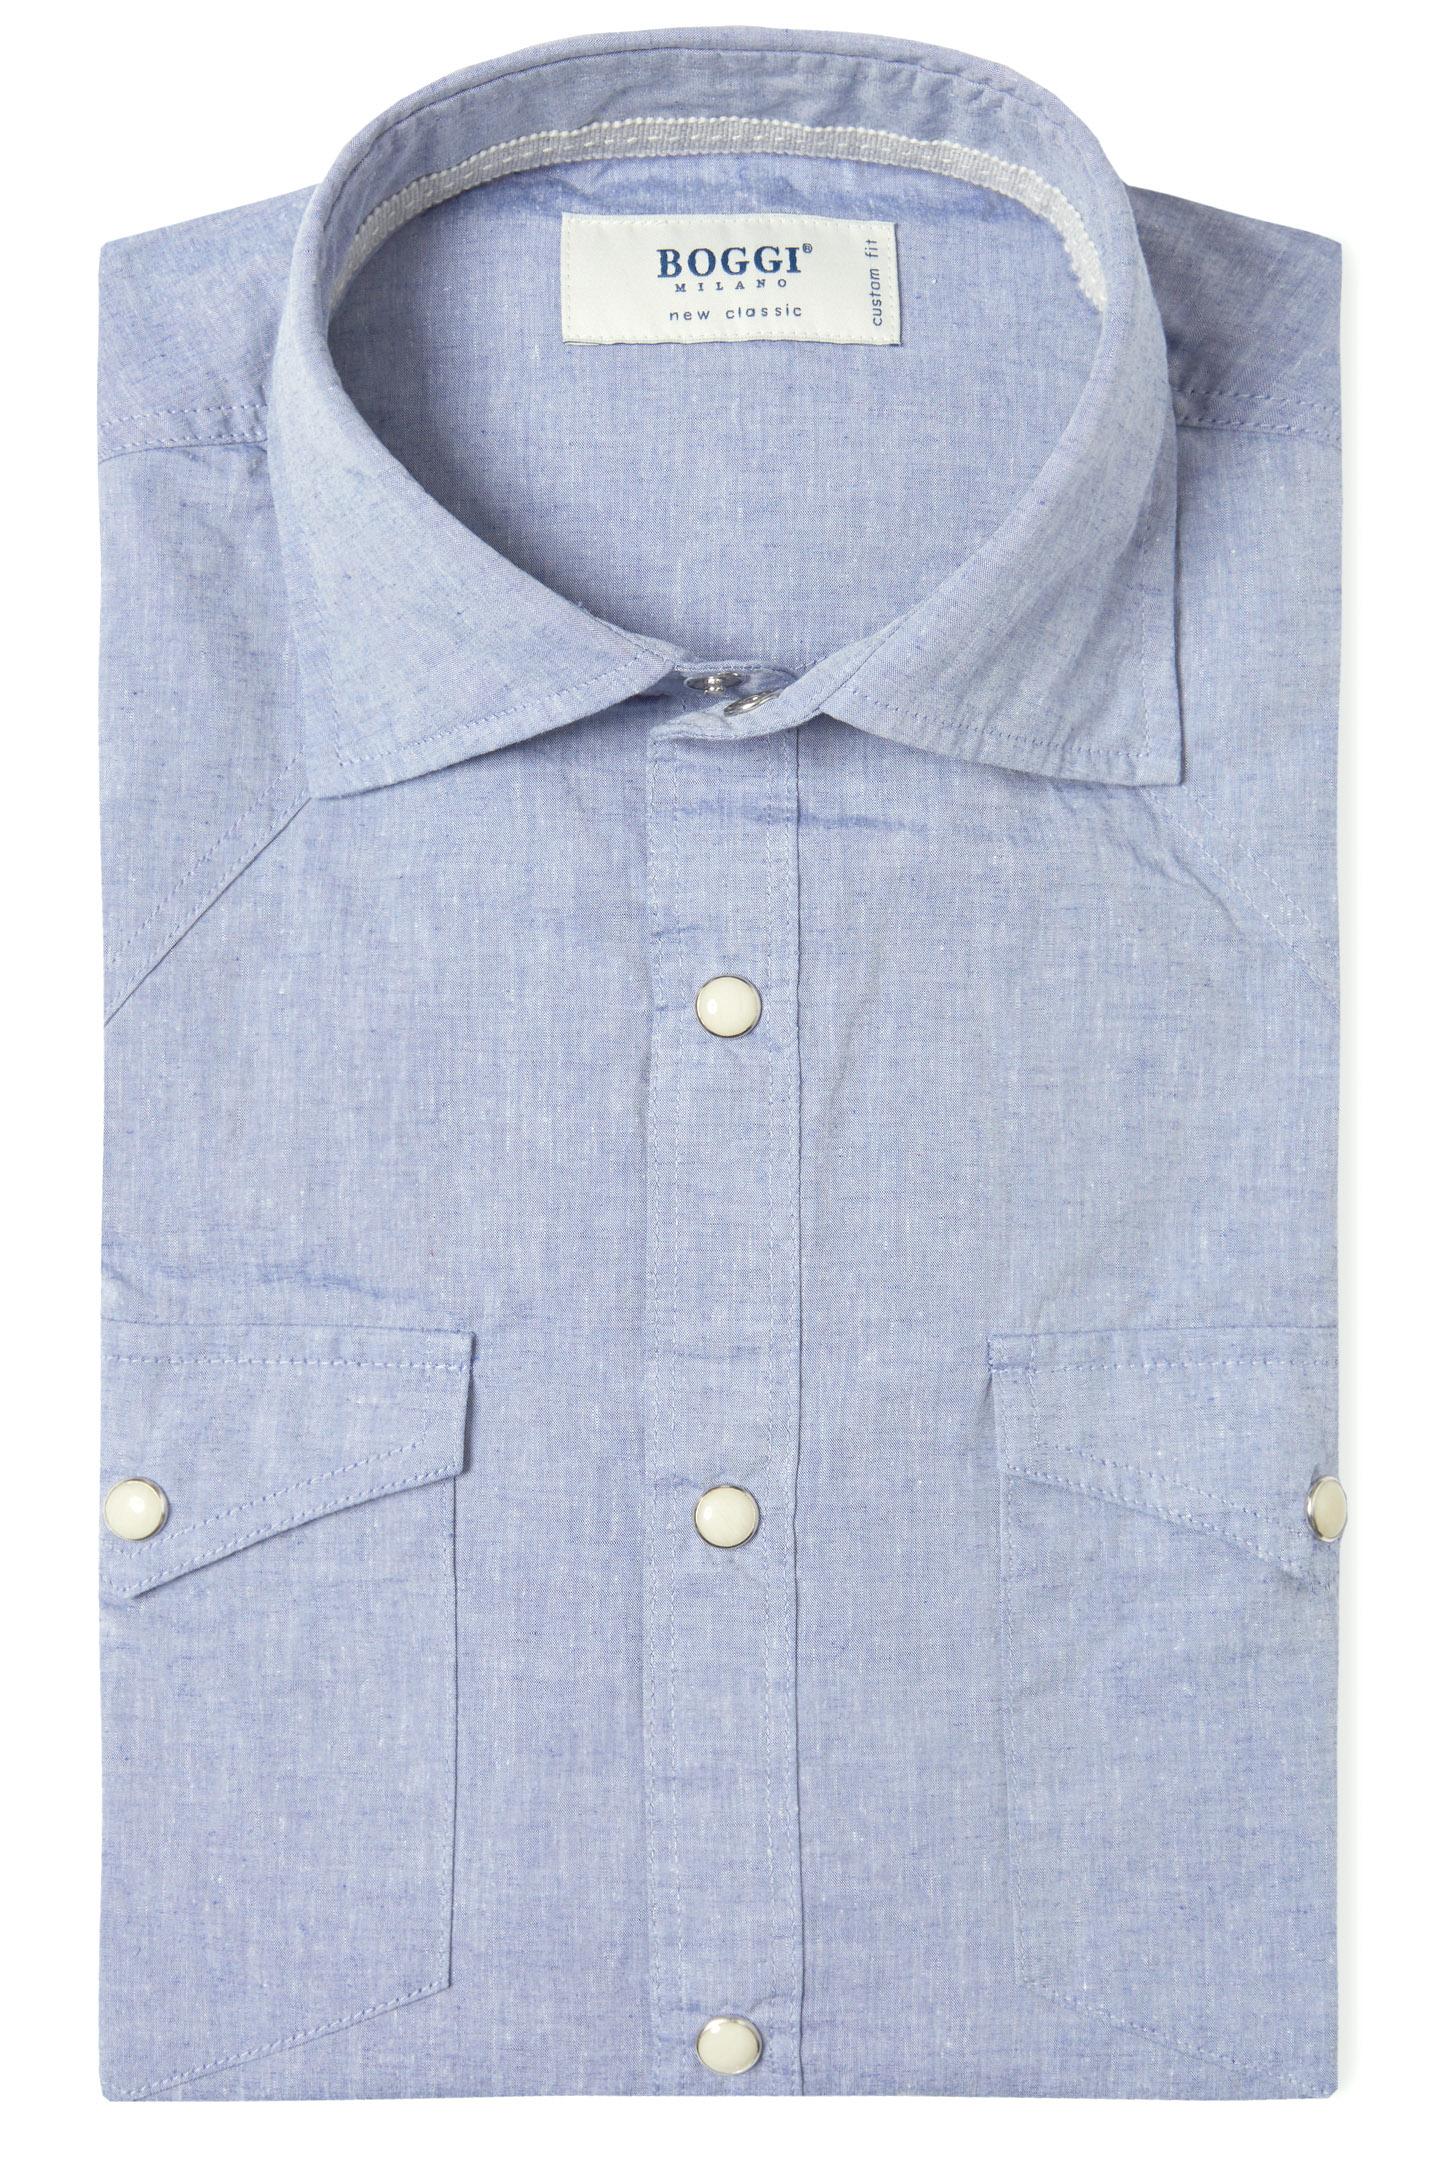 Custom Fit Poplin Cotton Shirt With Soft Collar Blue Boggi